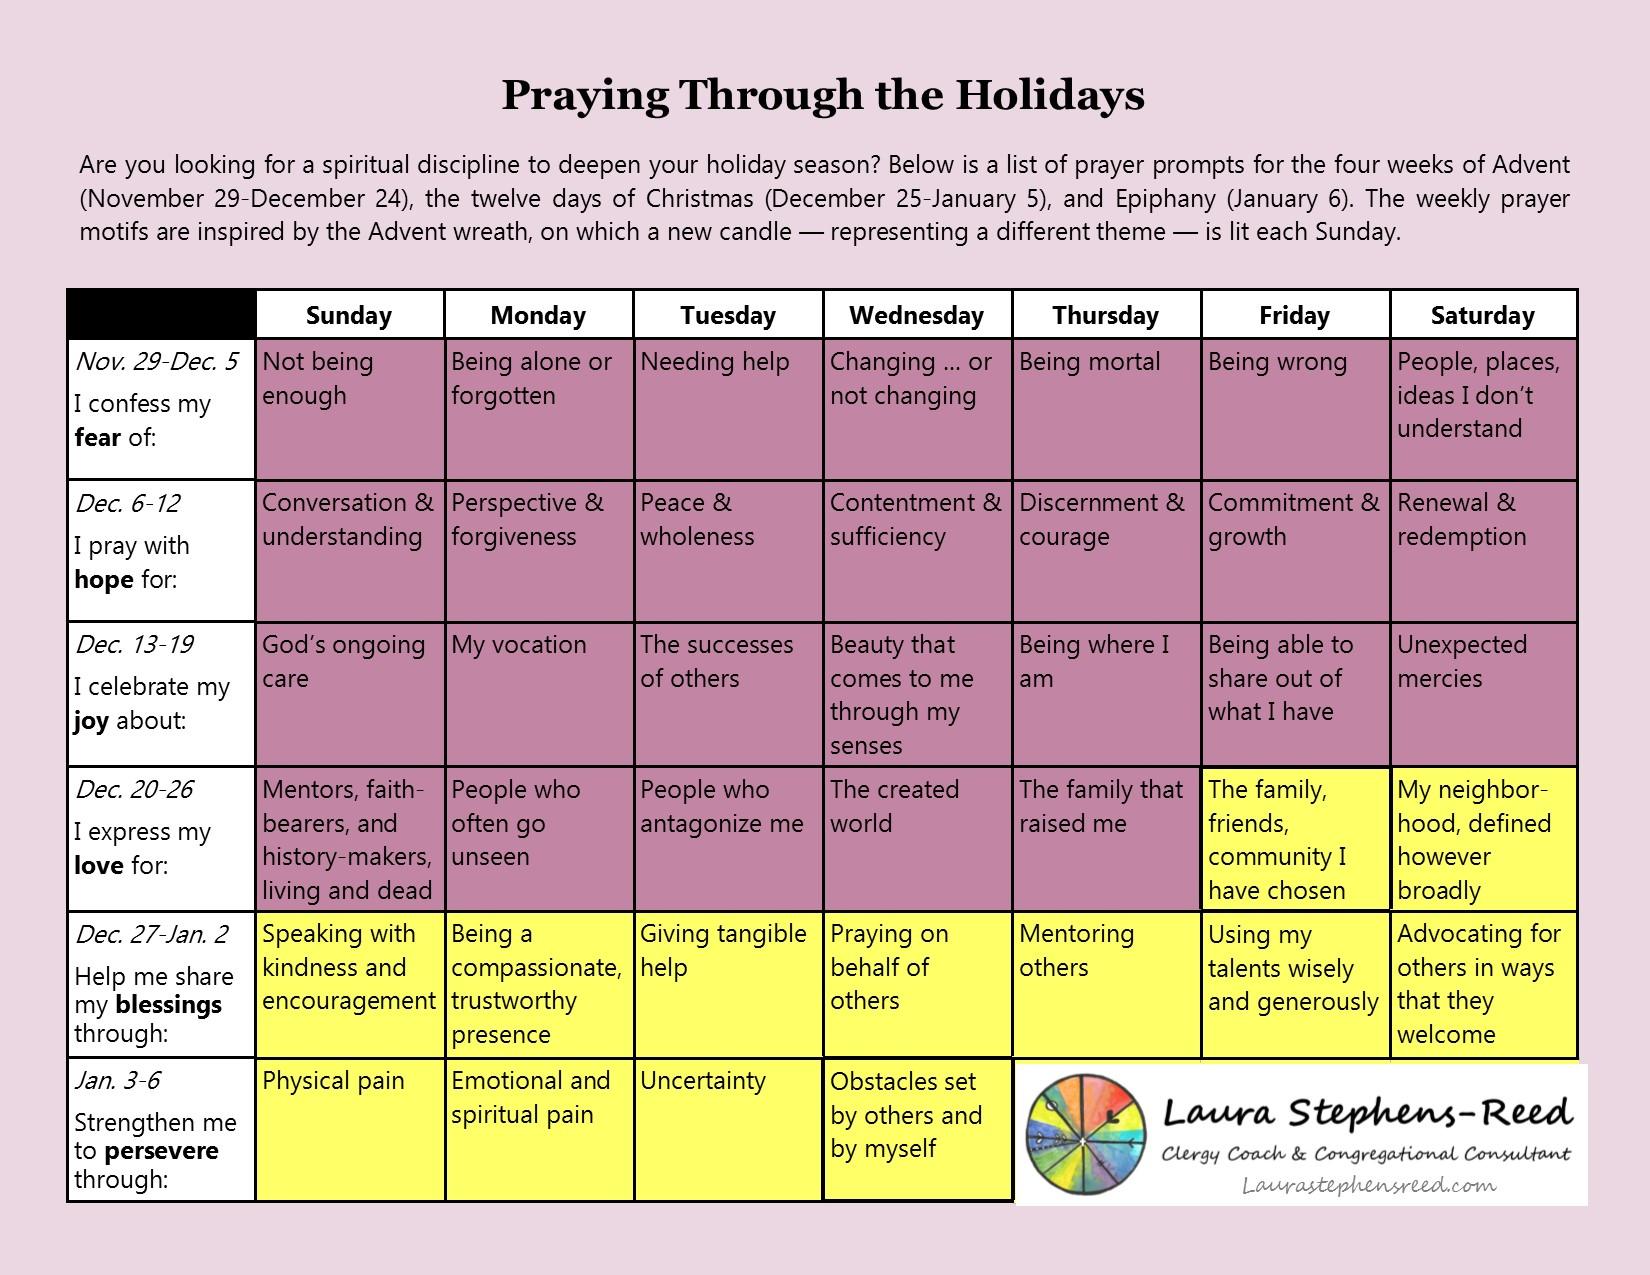 advent prayer calendar laura stephens reed